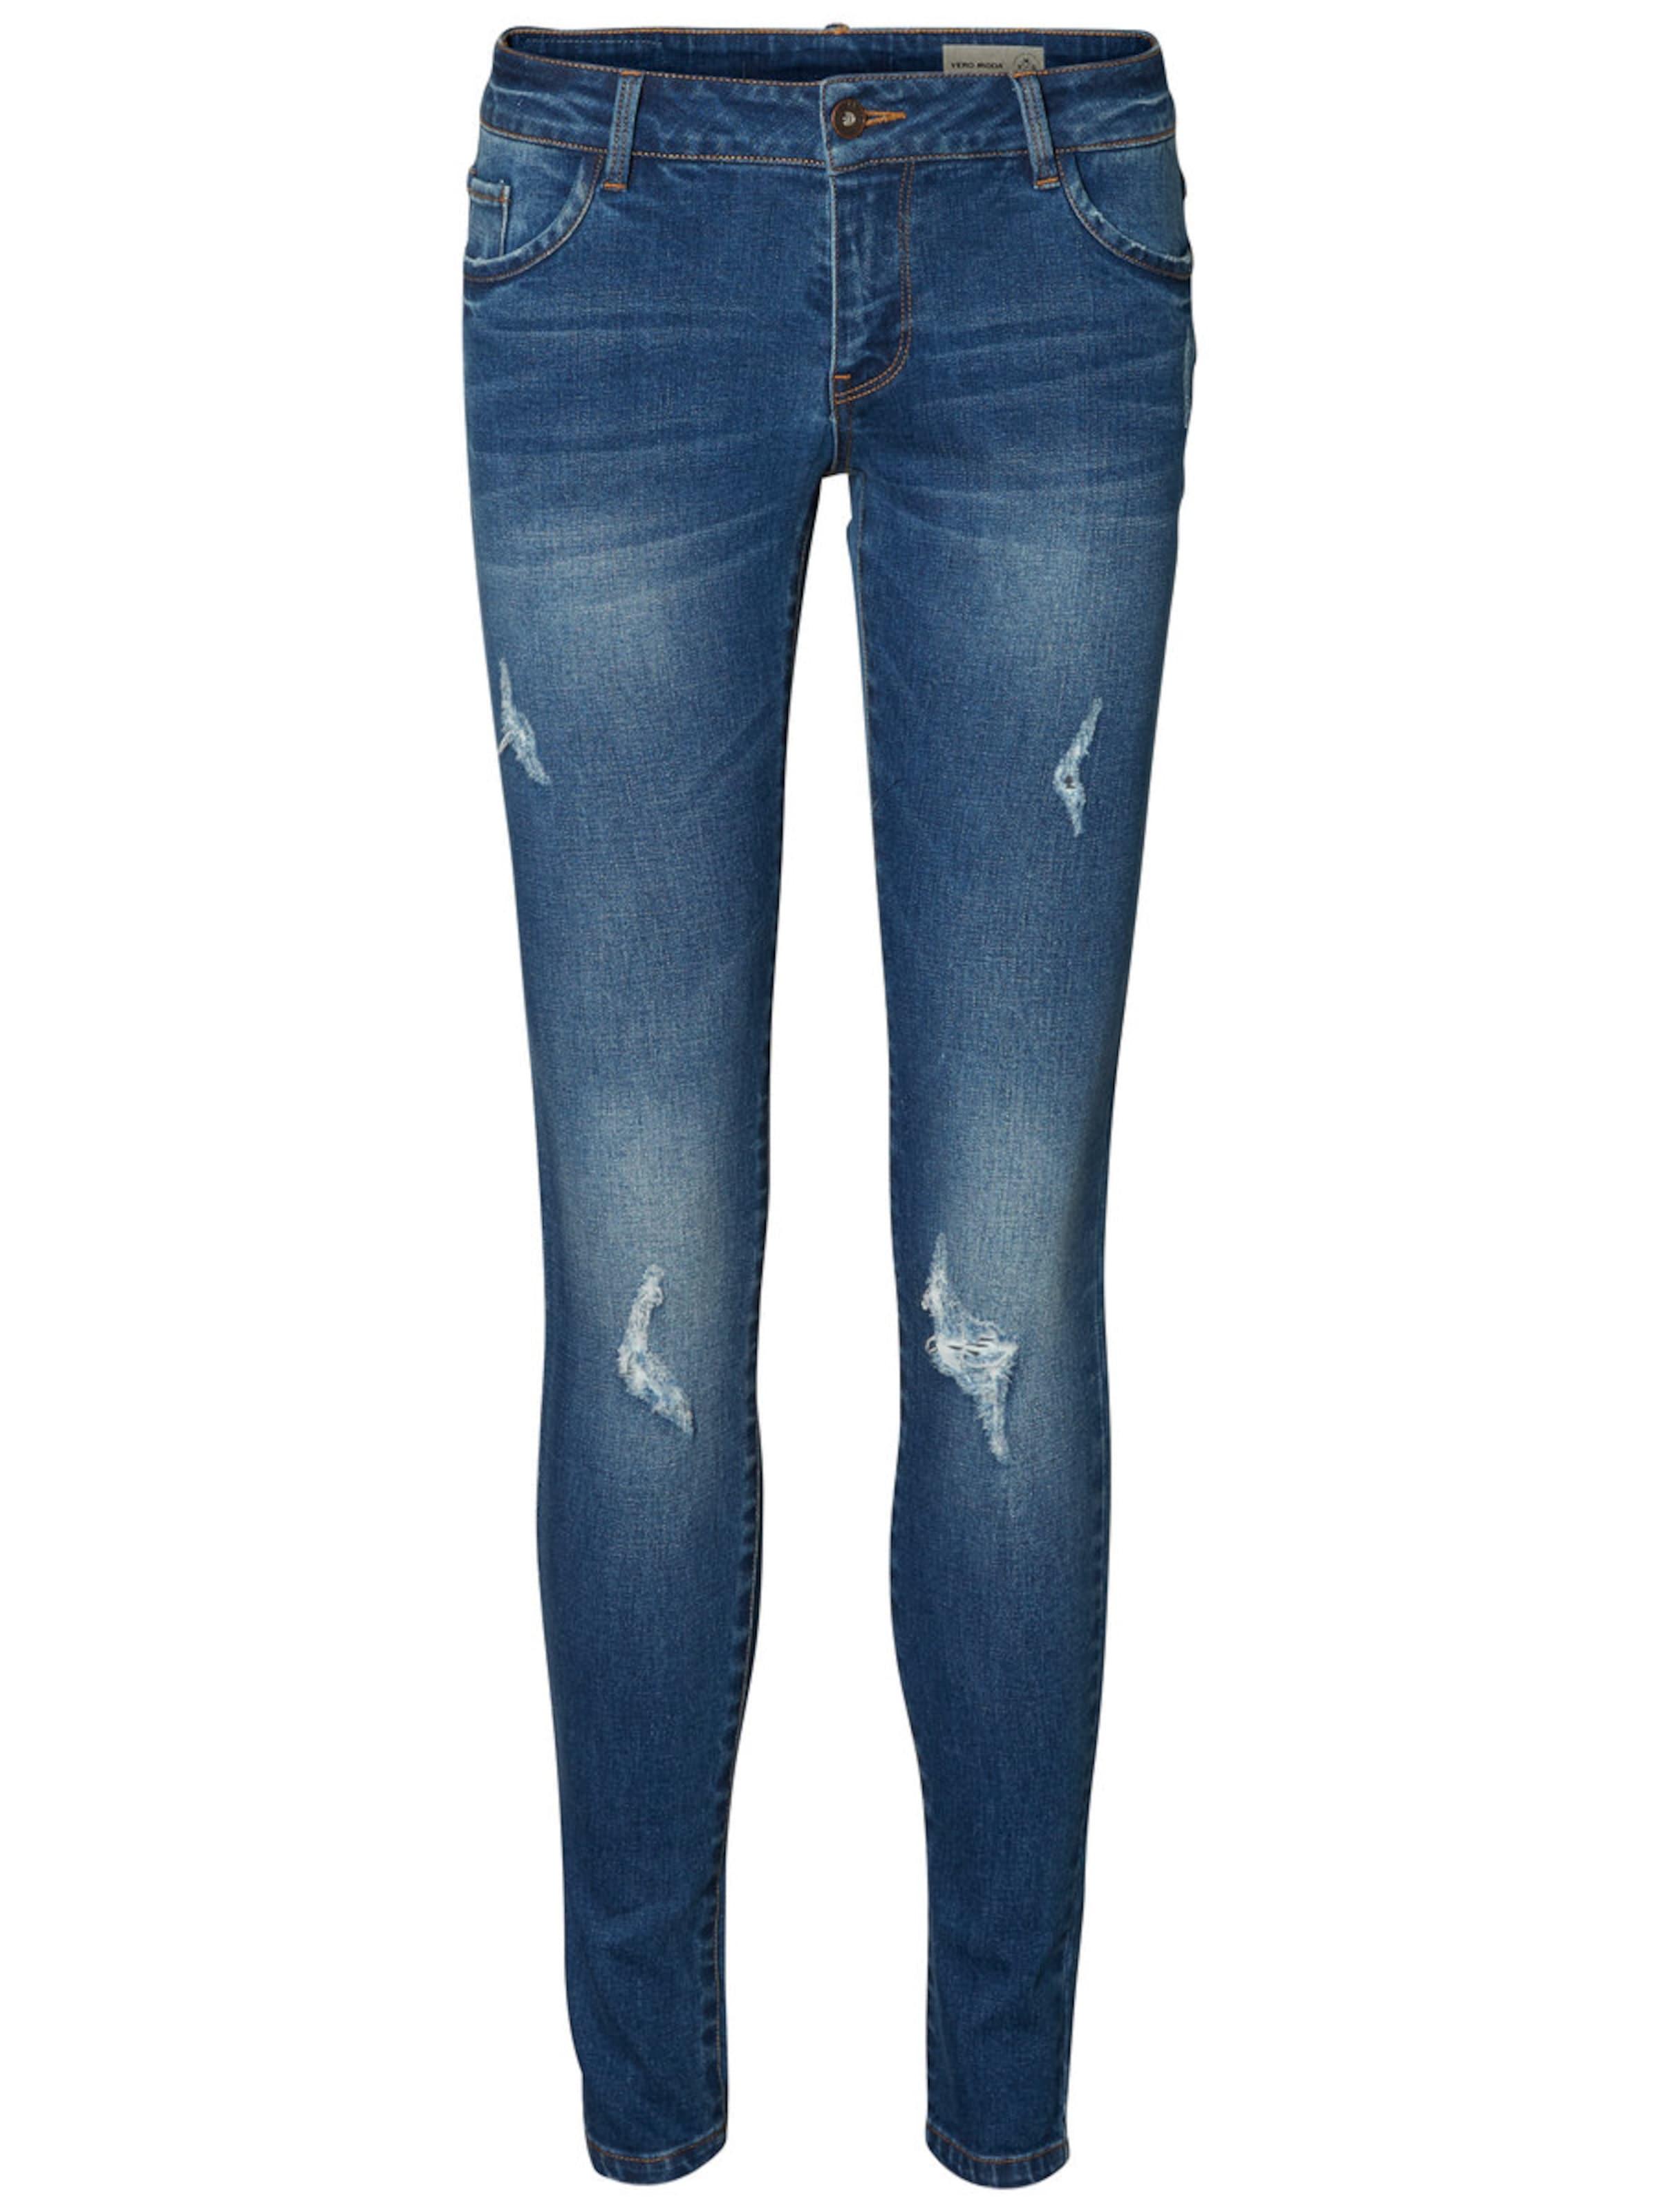 VERO MODA Five LW Skinny Fit Jeans Billig Verkauf Extrem LK12SbGqp